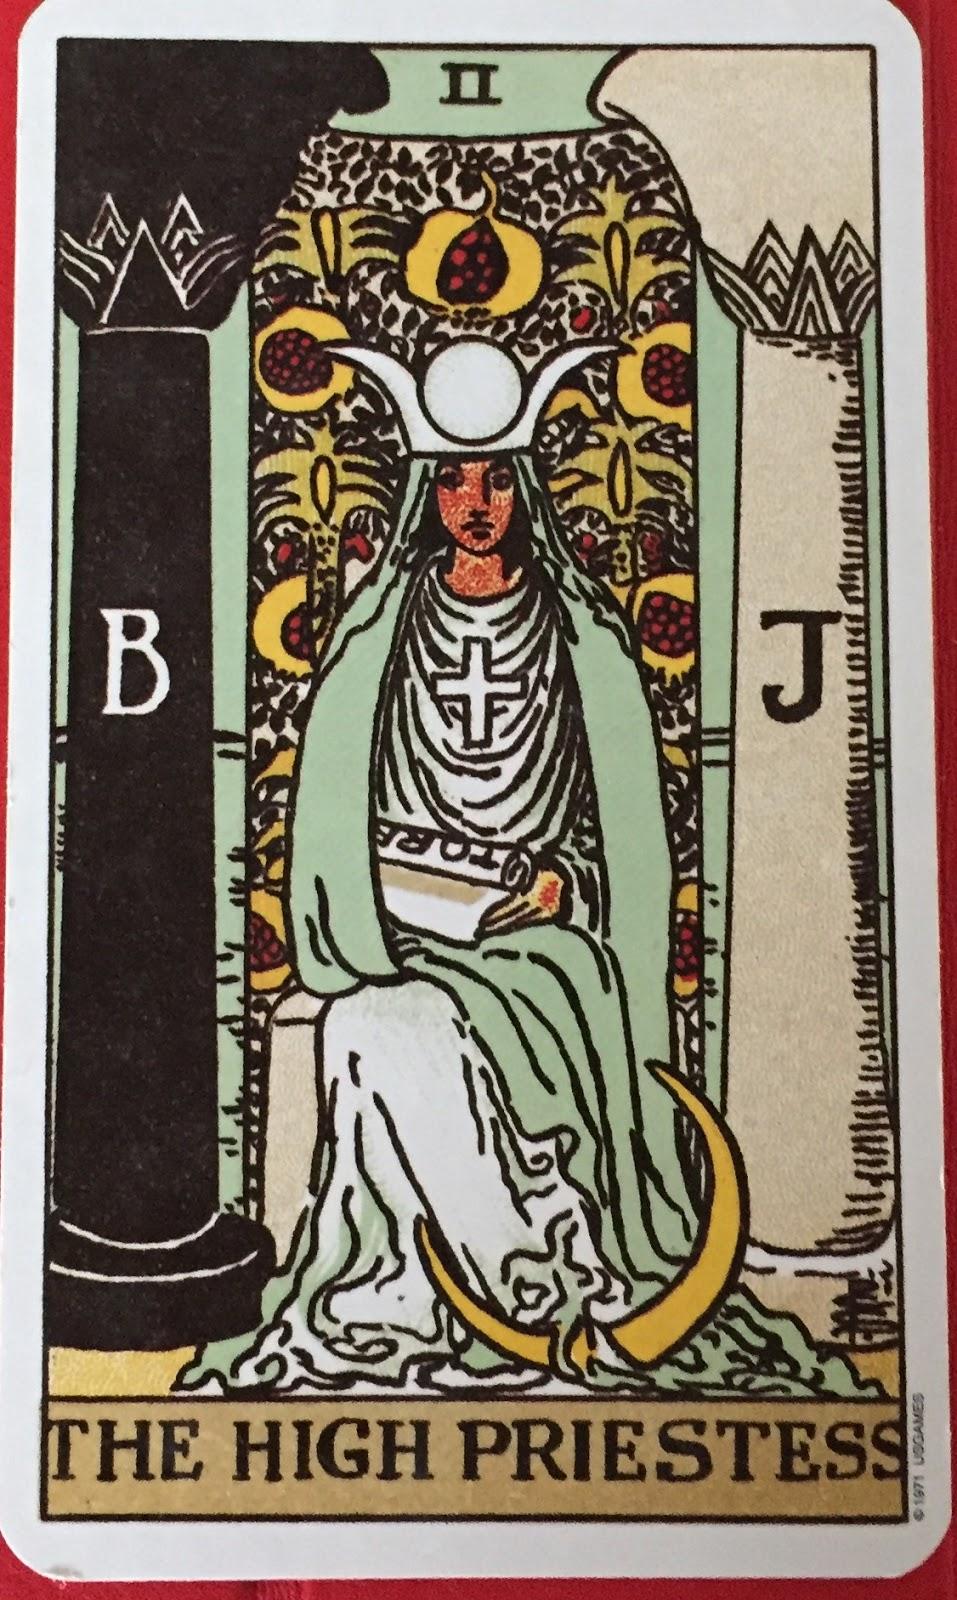 Helen H's Tarot Blog: Learn Tarot With Me